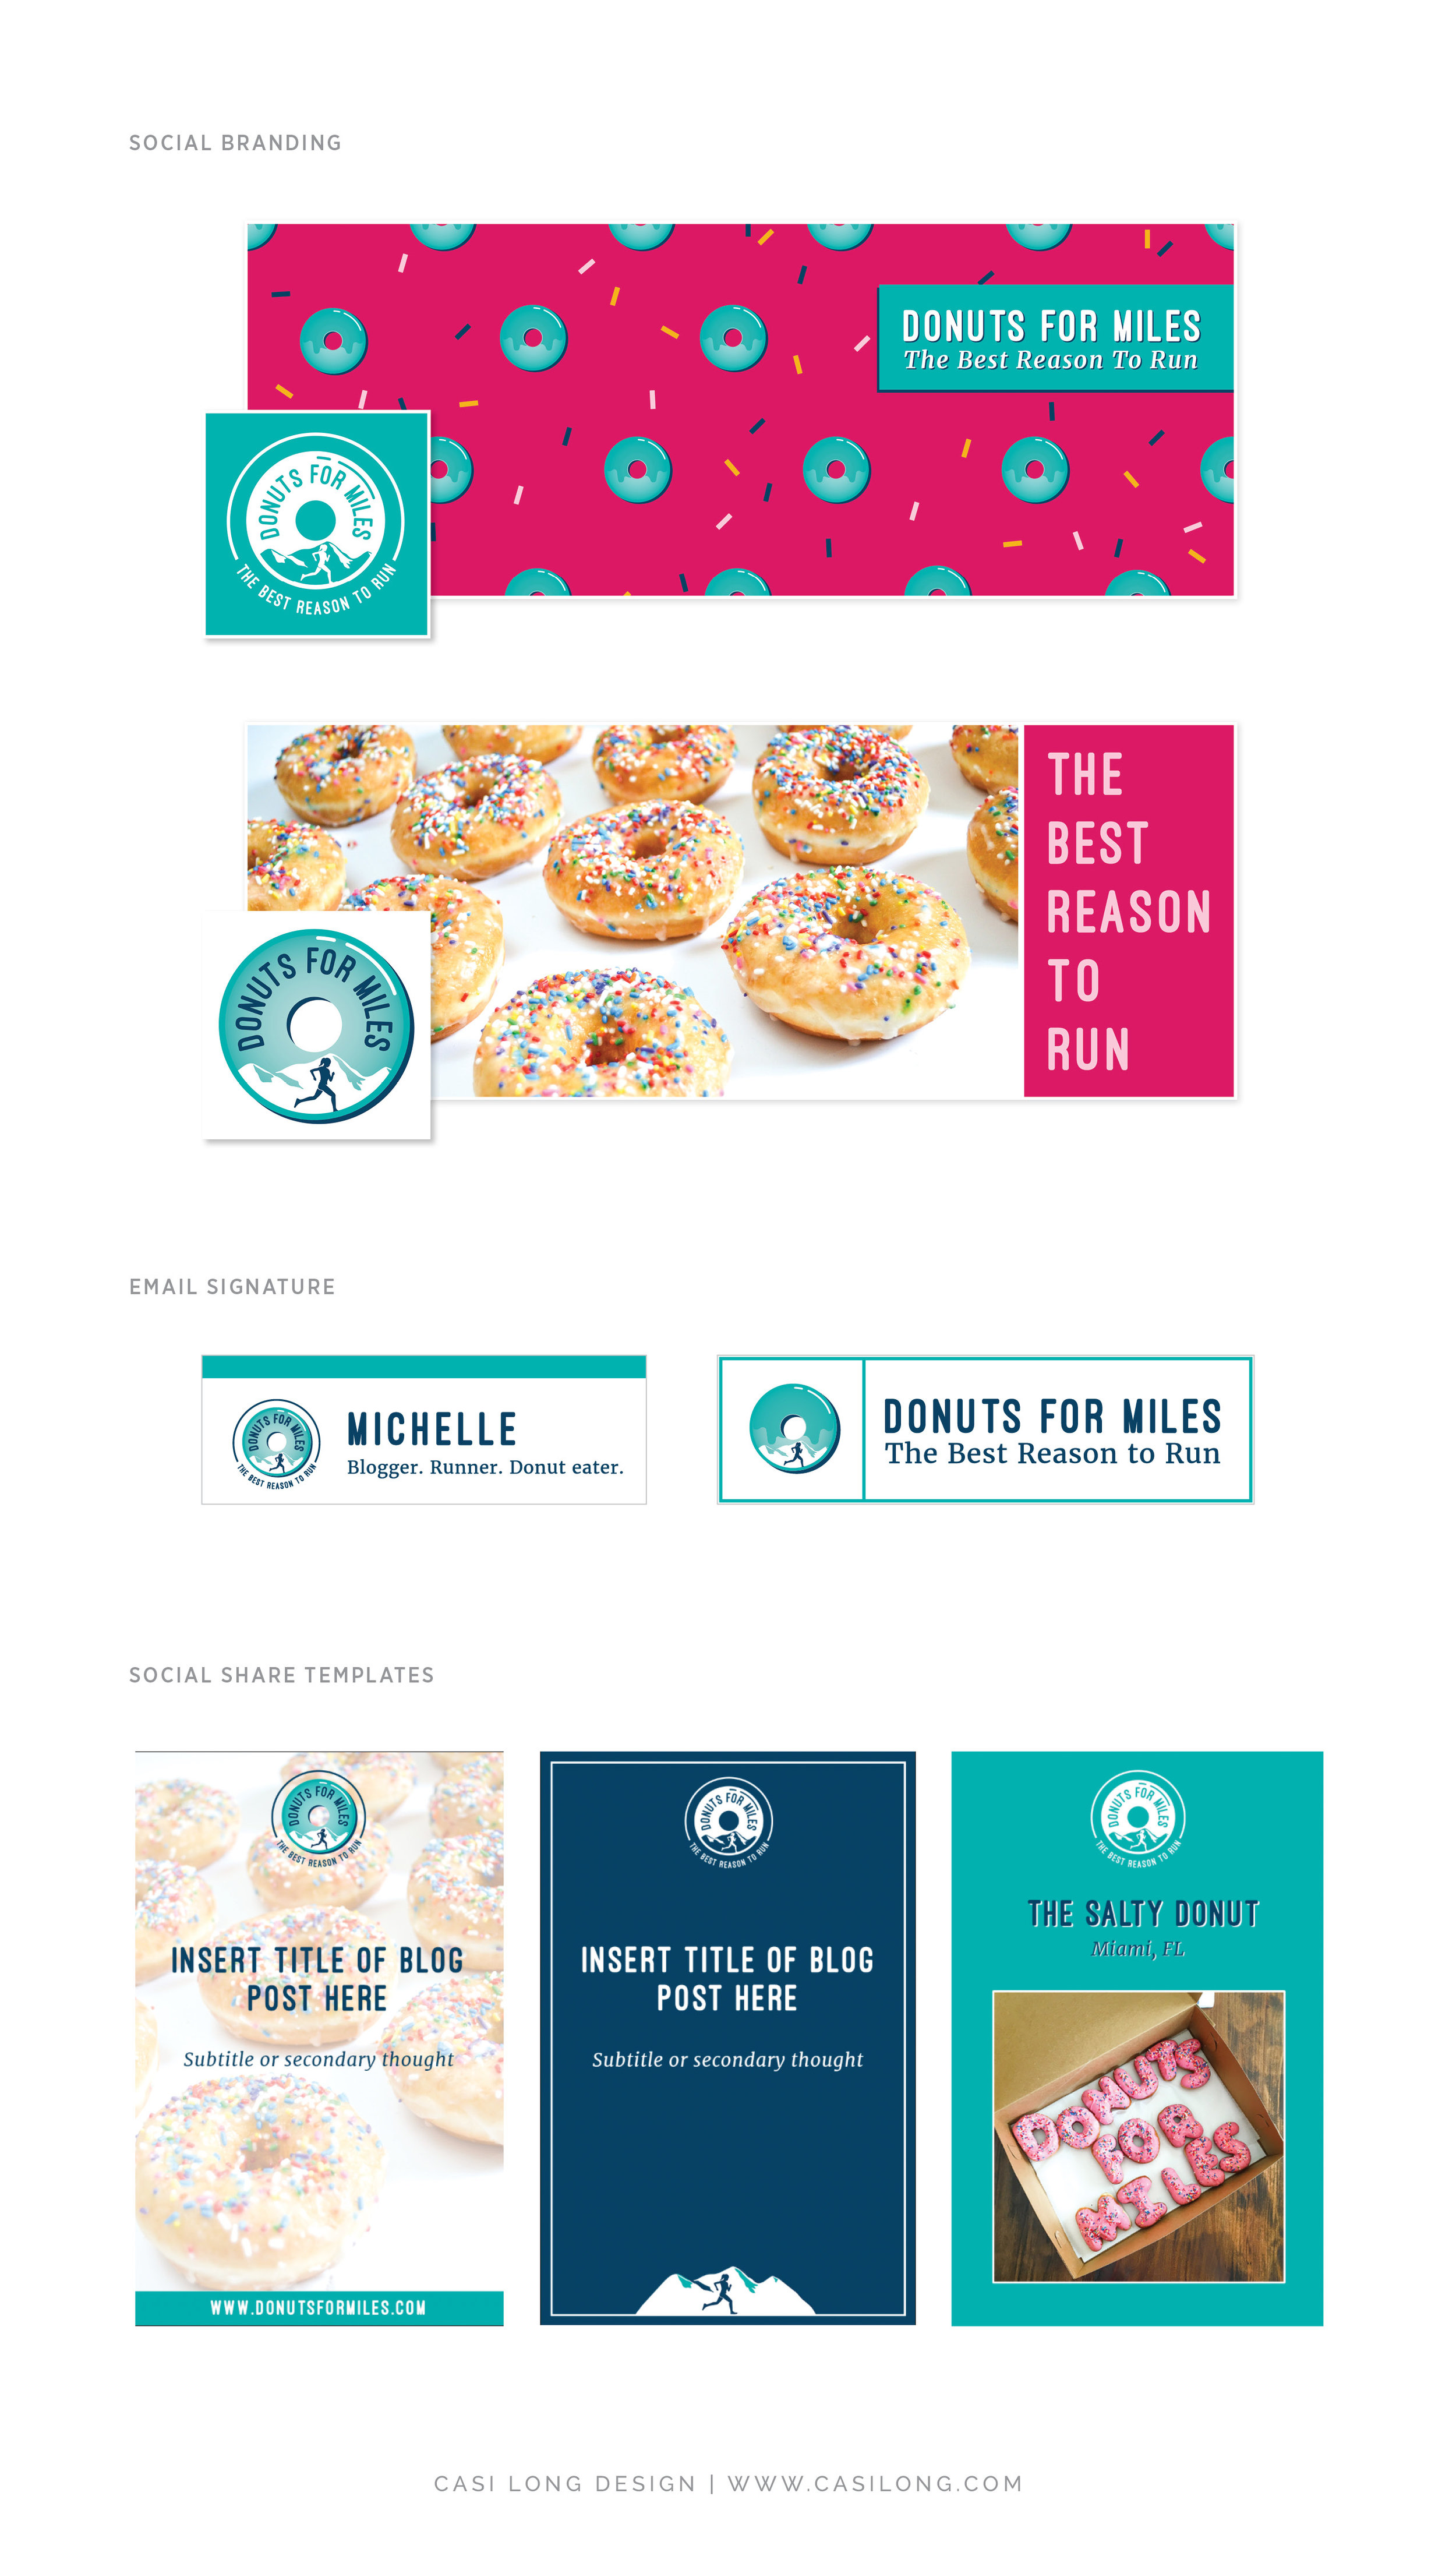 Social Media Branding Donuts for Miles | Branding by Casi Long Design | www.casilong.com #casilongdesign